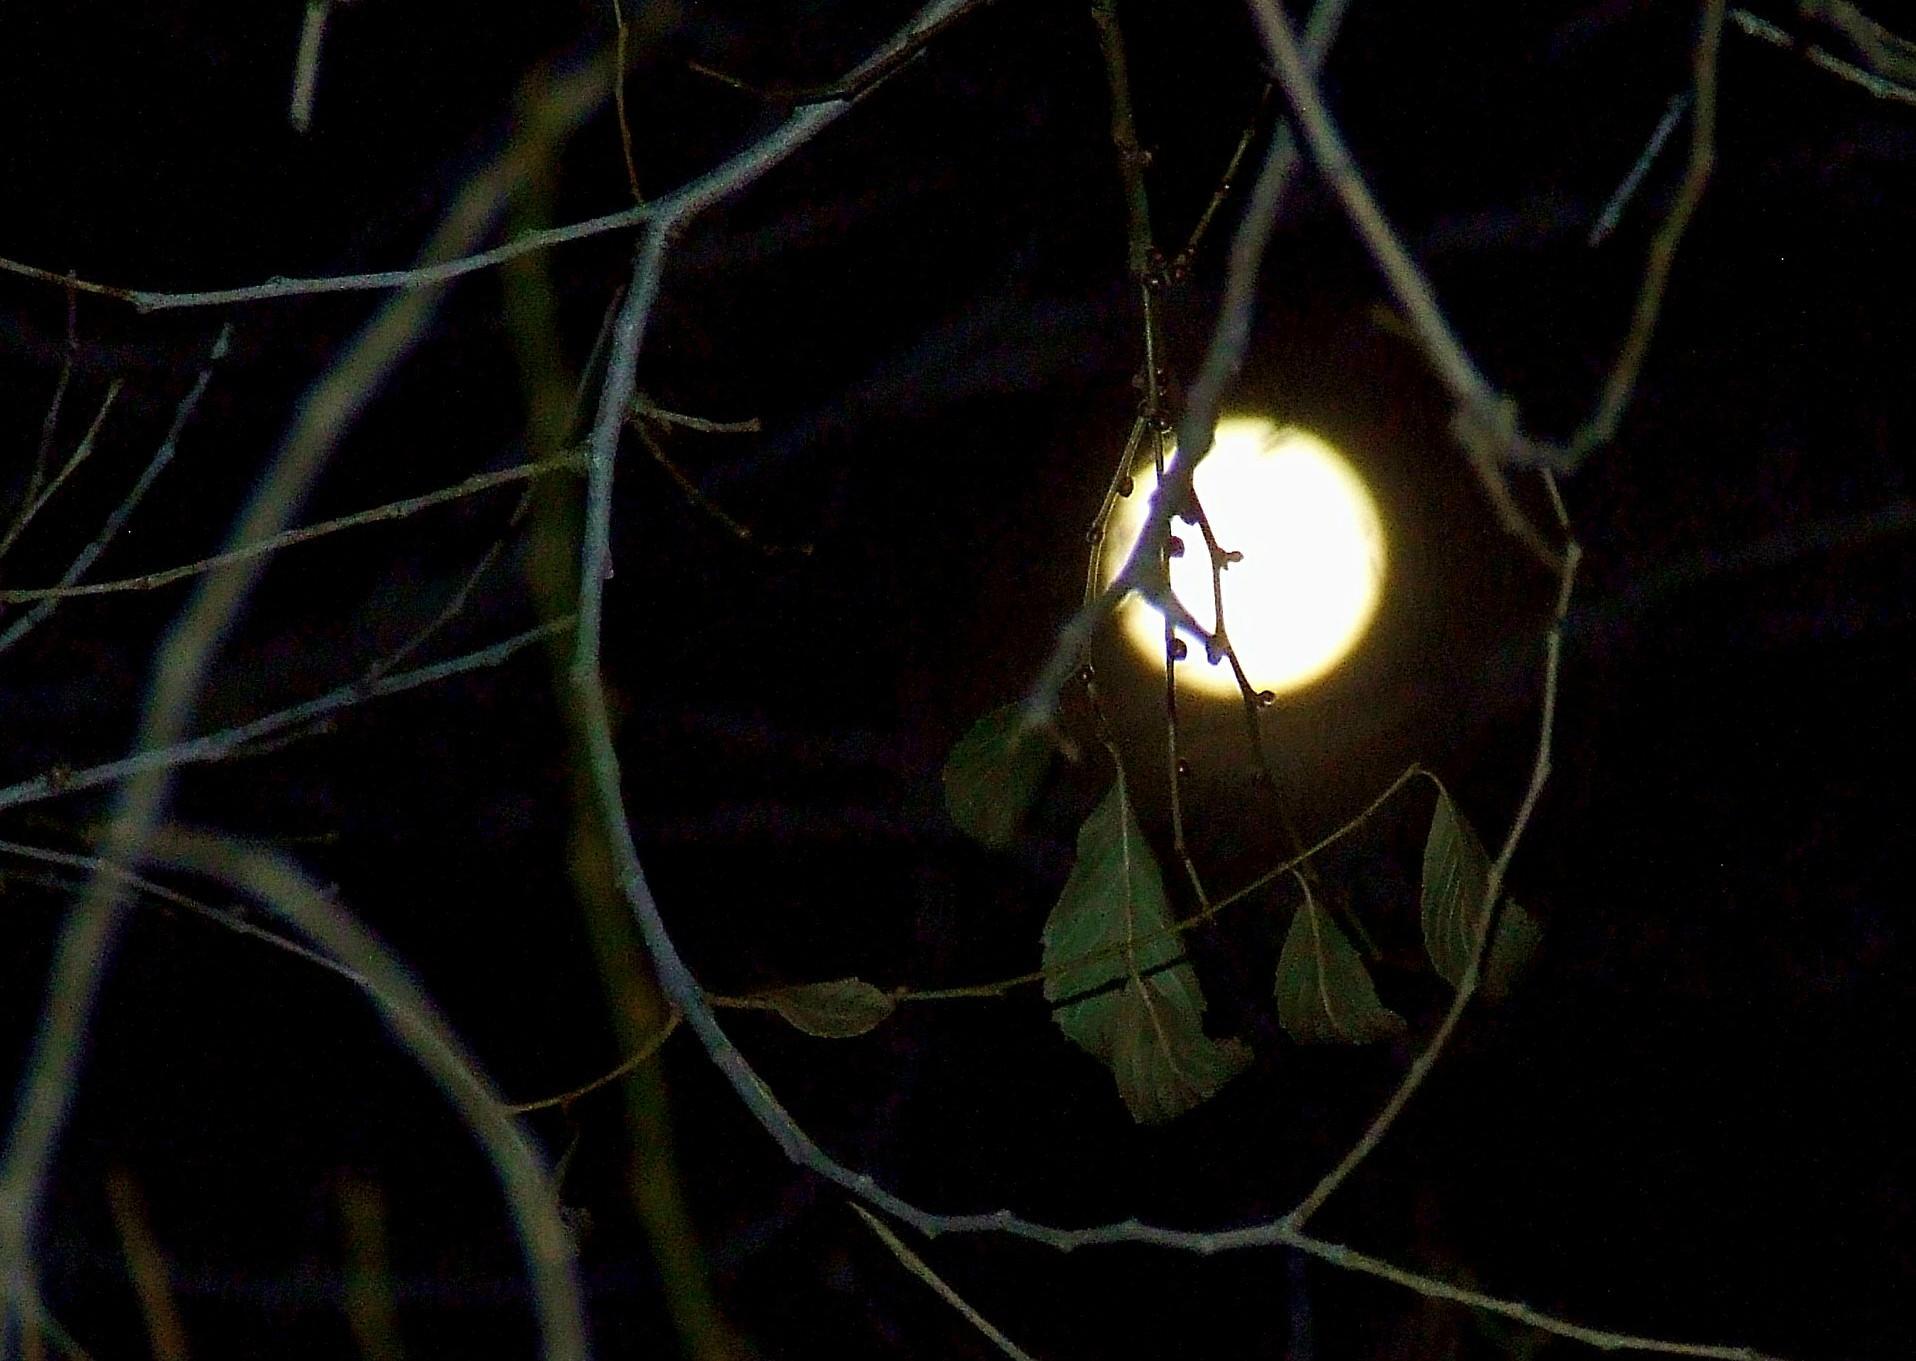 Moon in night tree